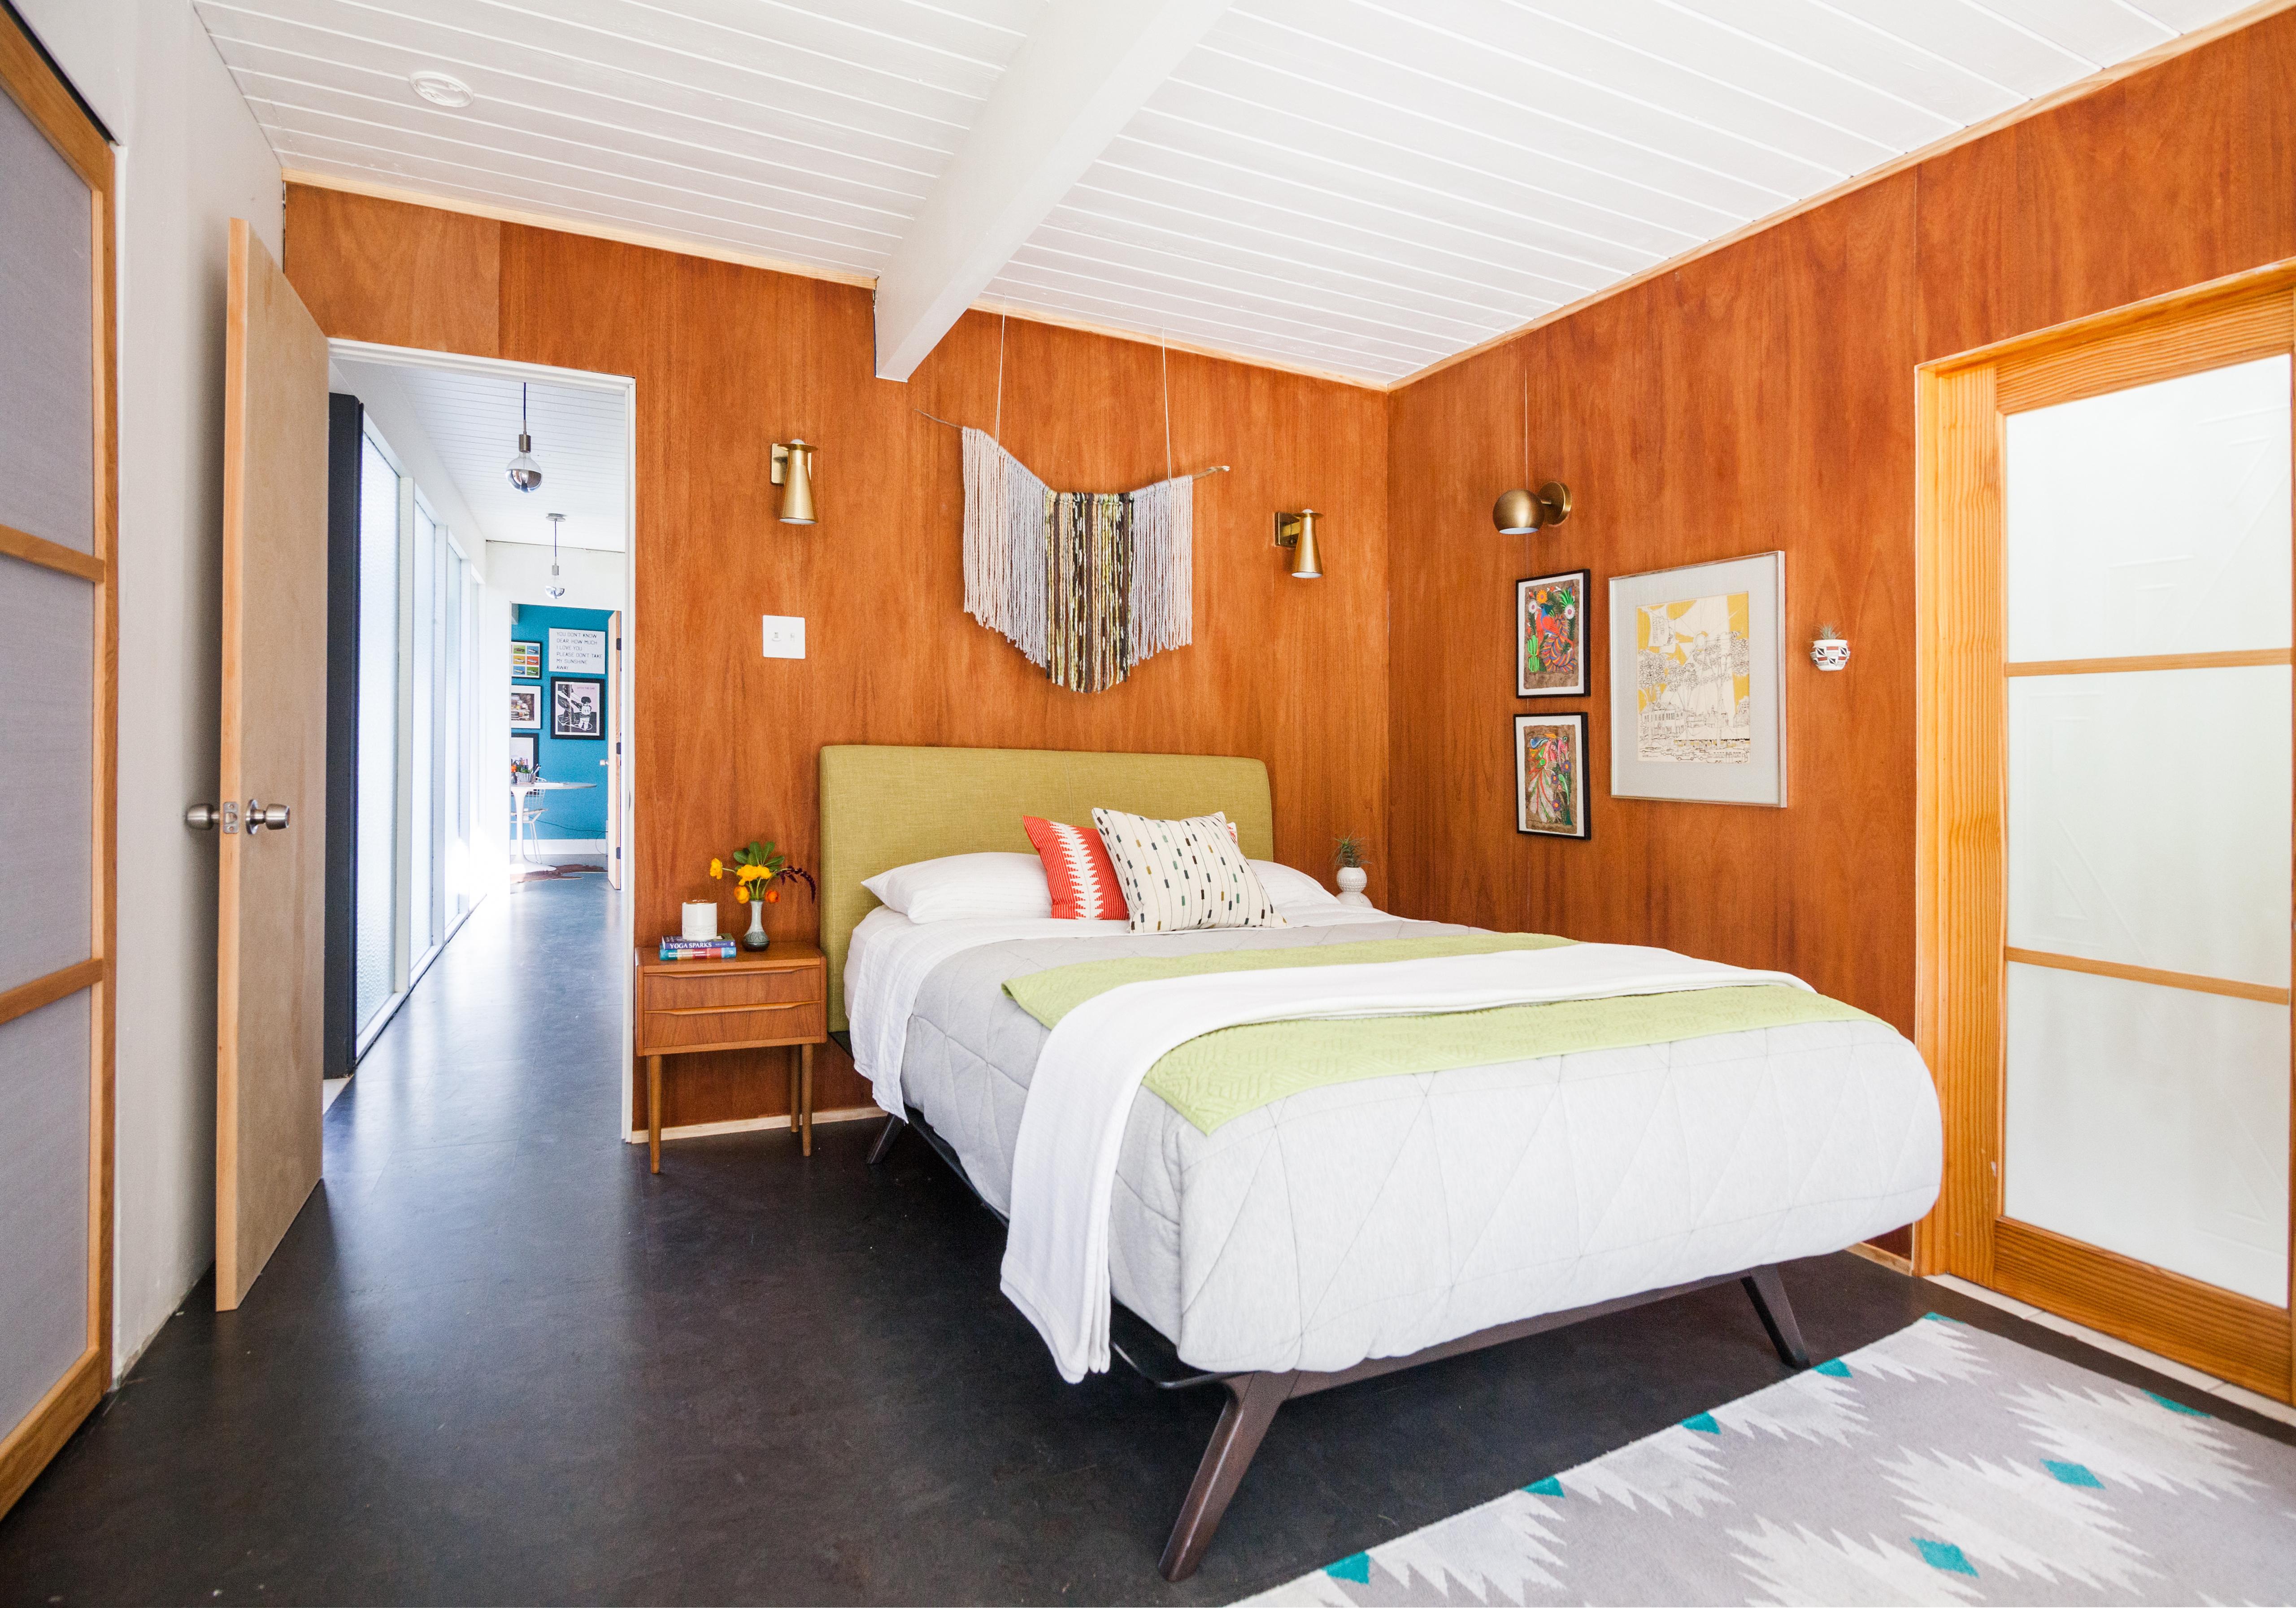 Bedroom-Hallway.jpg?mtime=20181005134911#asset:419714